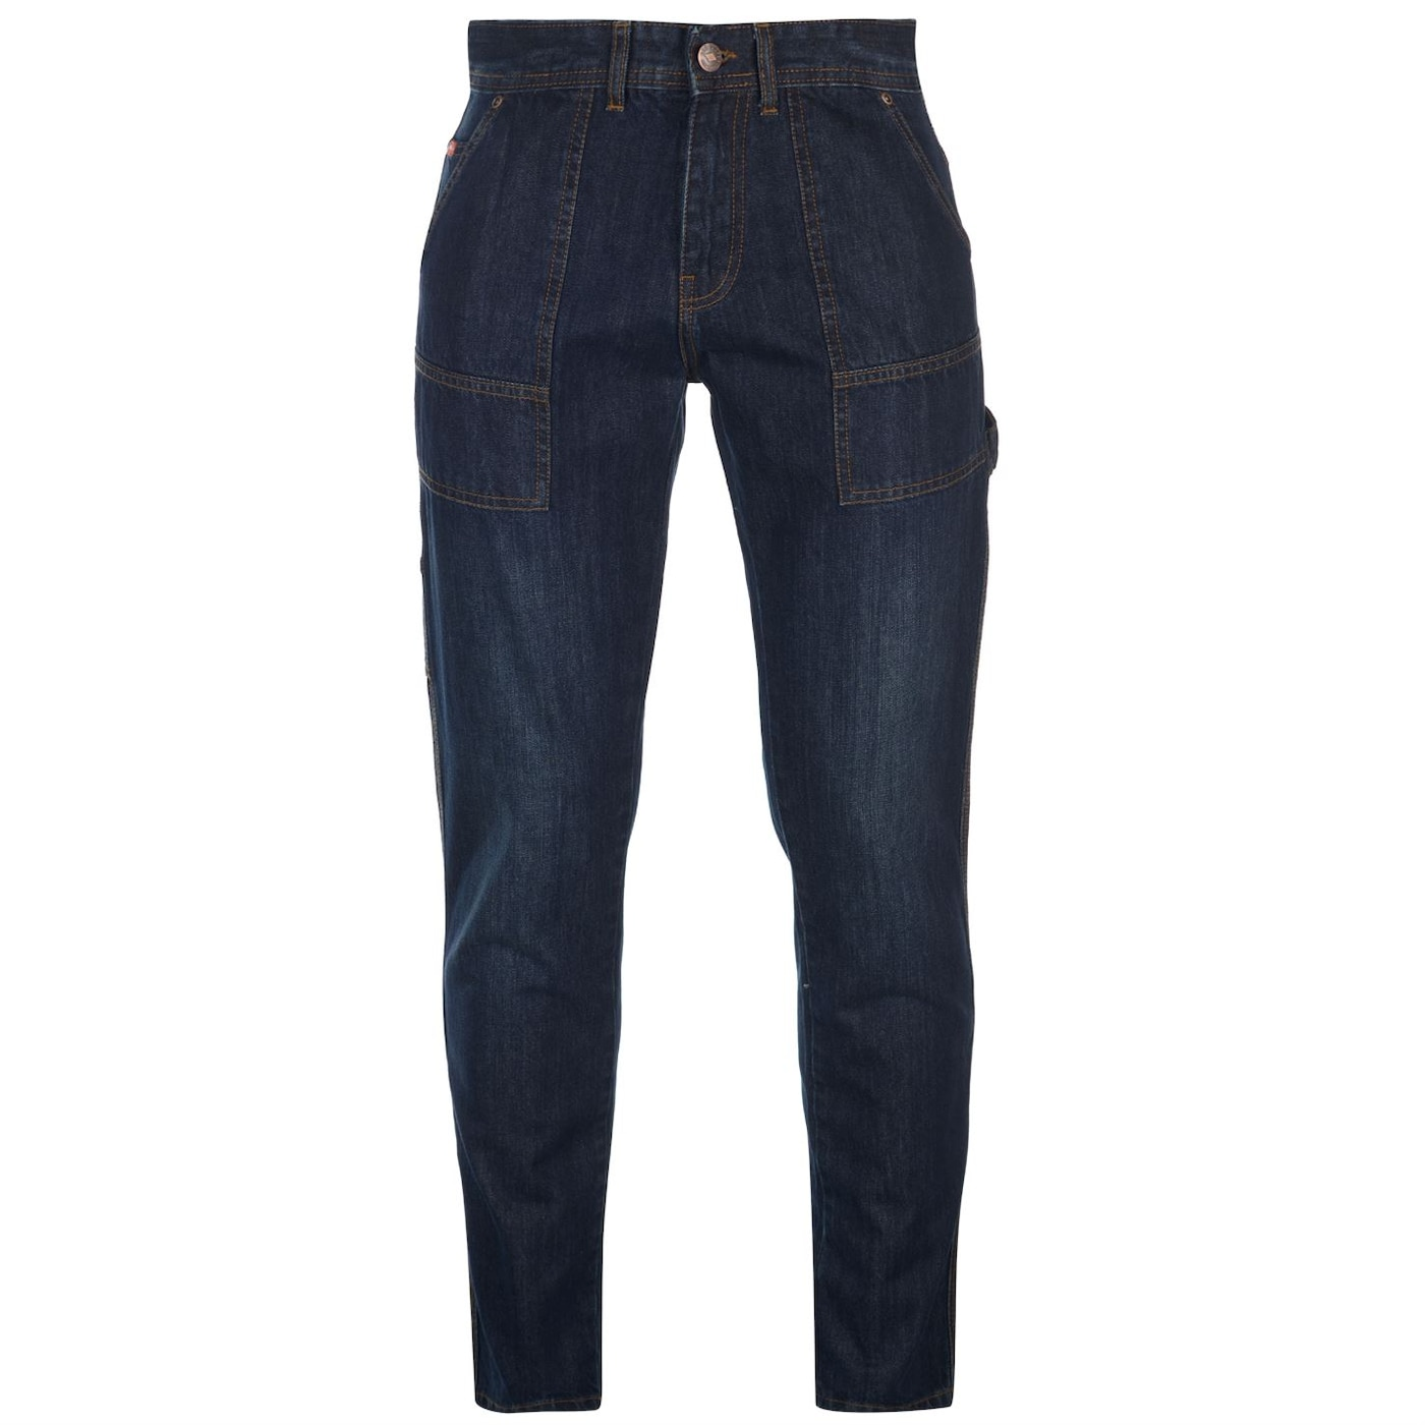 Lee Cooper Carpenter Jeans Mens